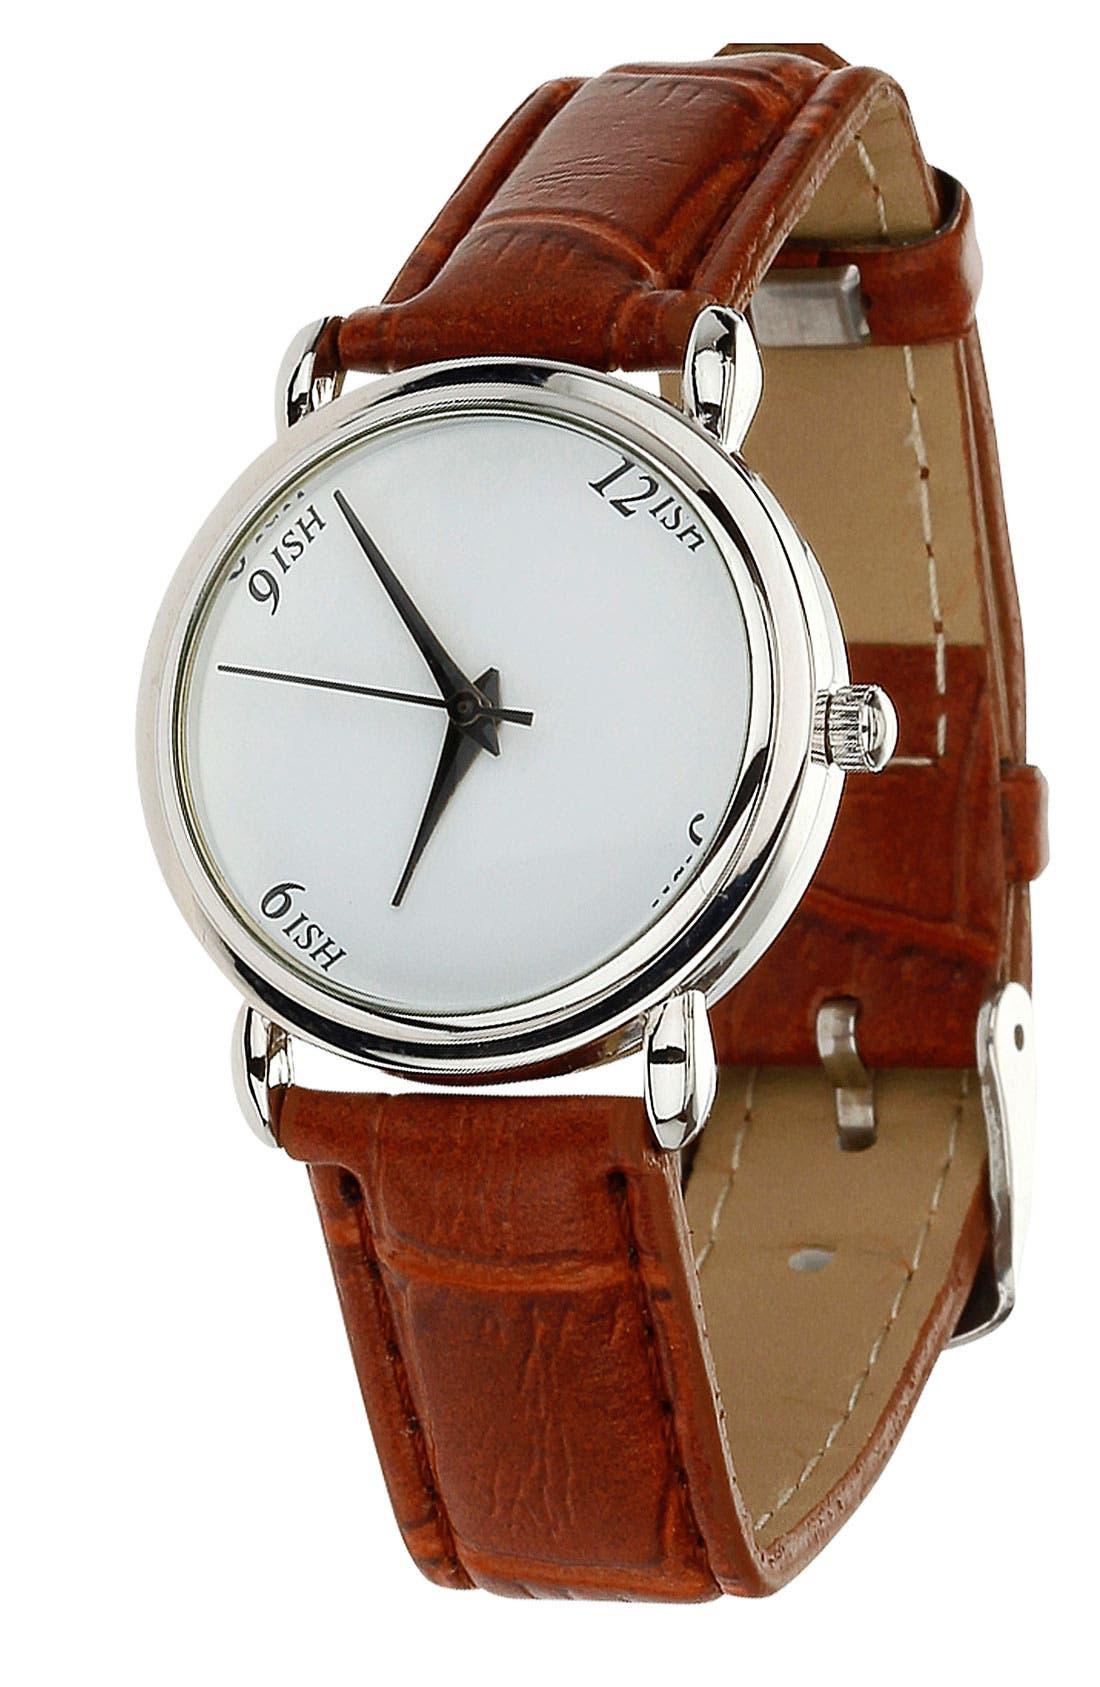 Main Image - Topman 'Ish' Leather Watch